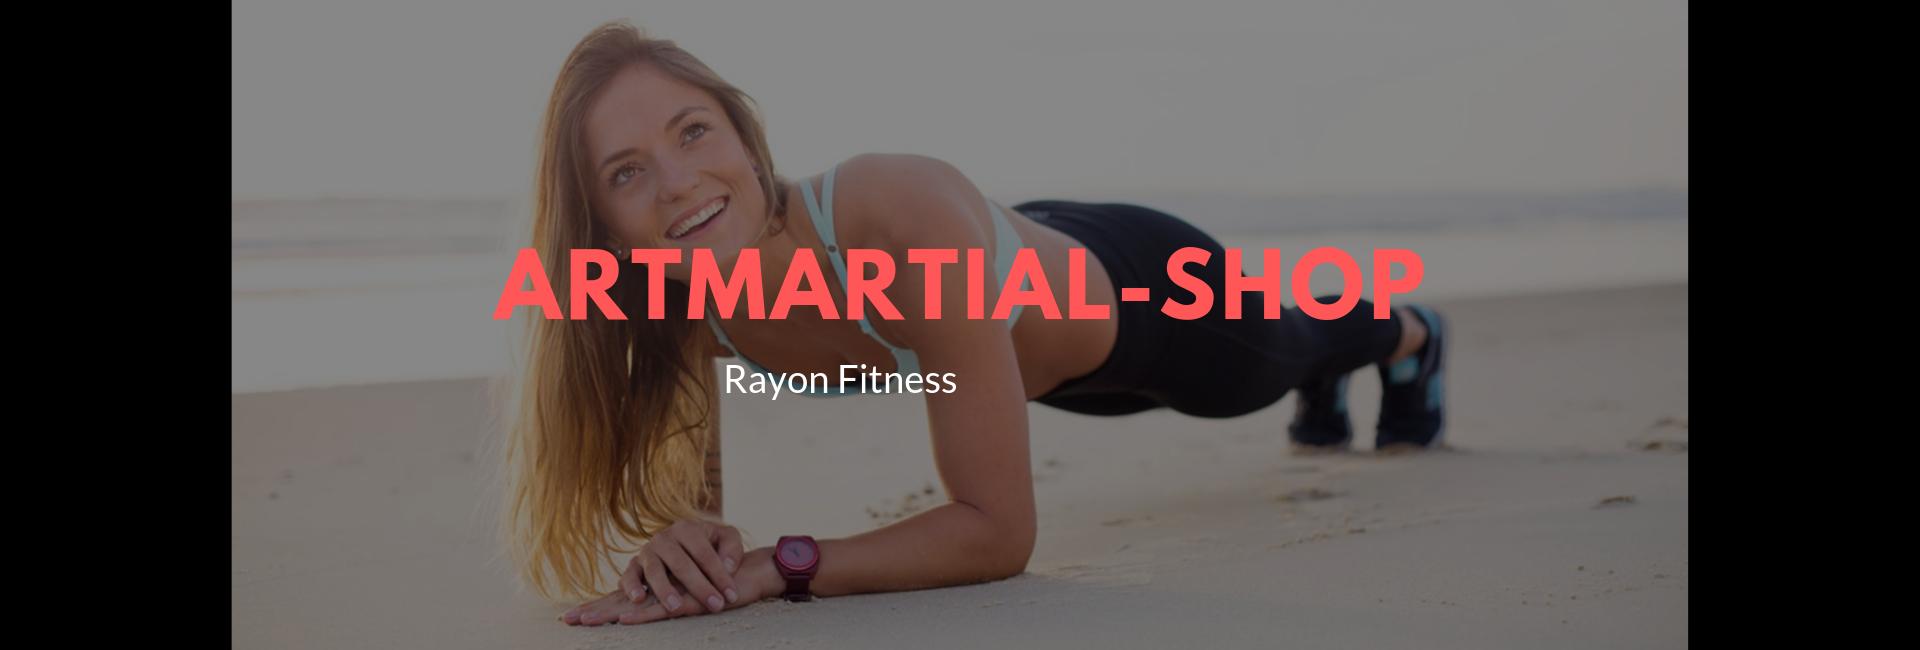 Art Martial Shop - Le Fitness